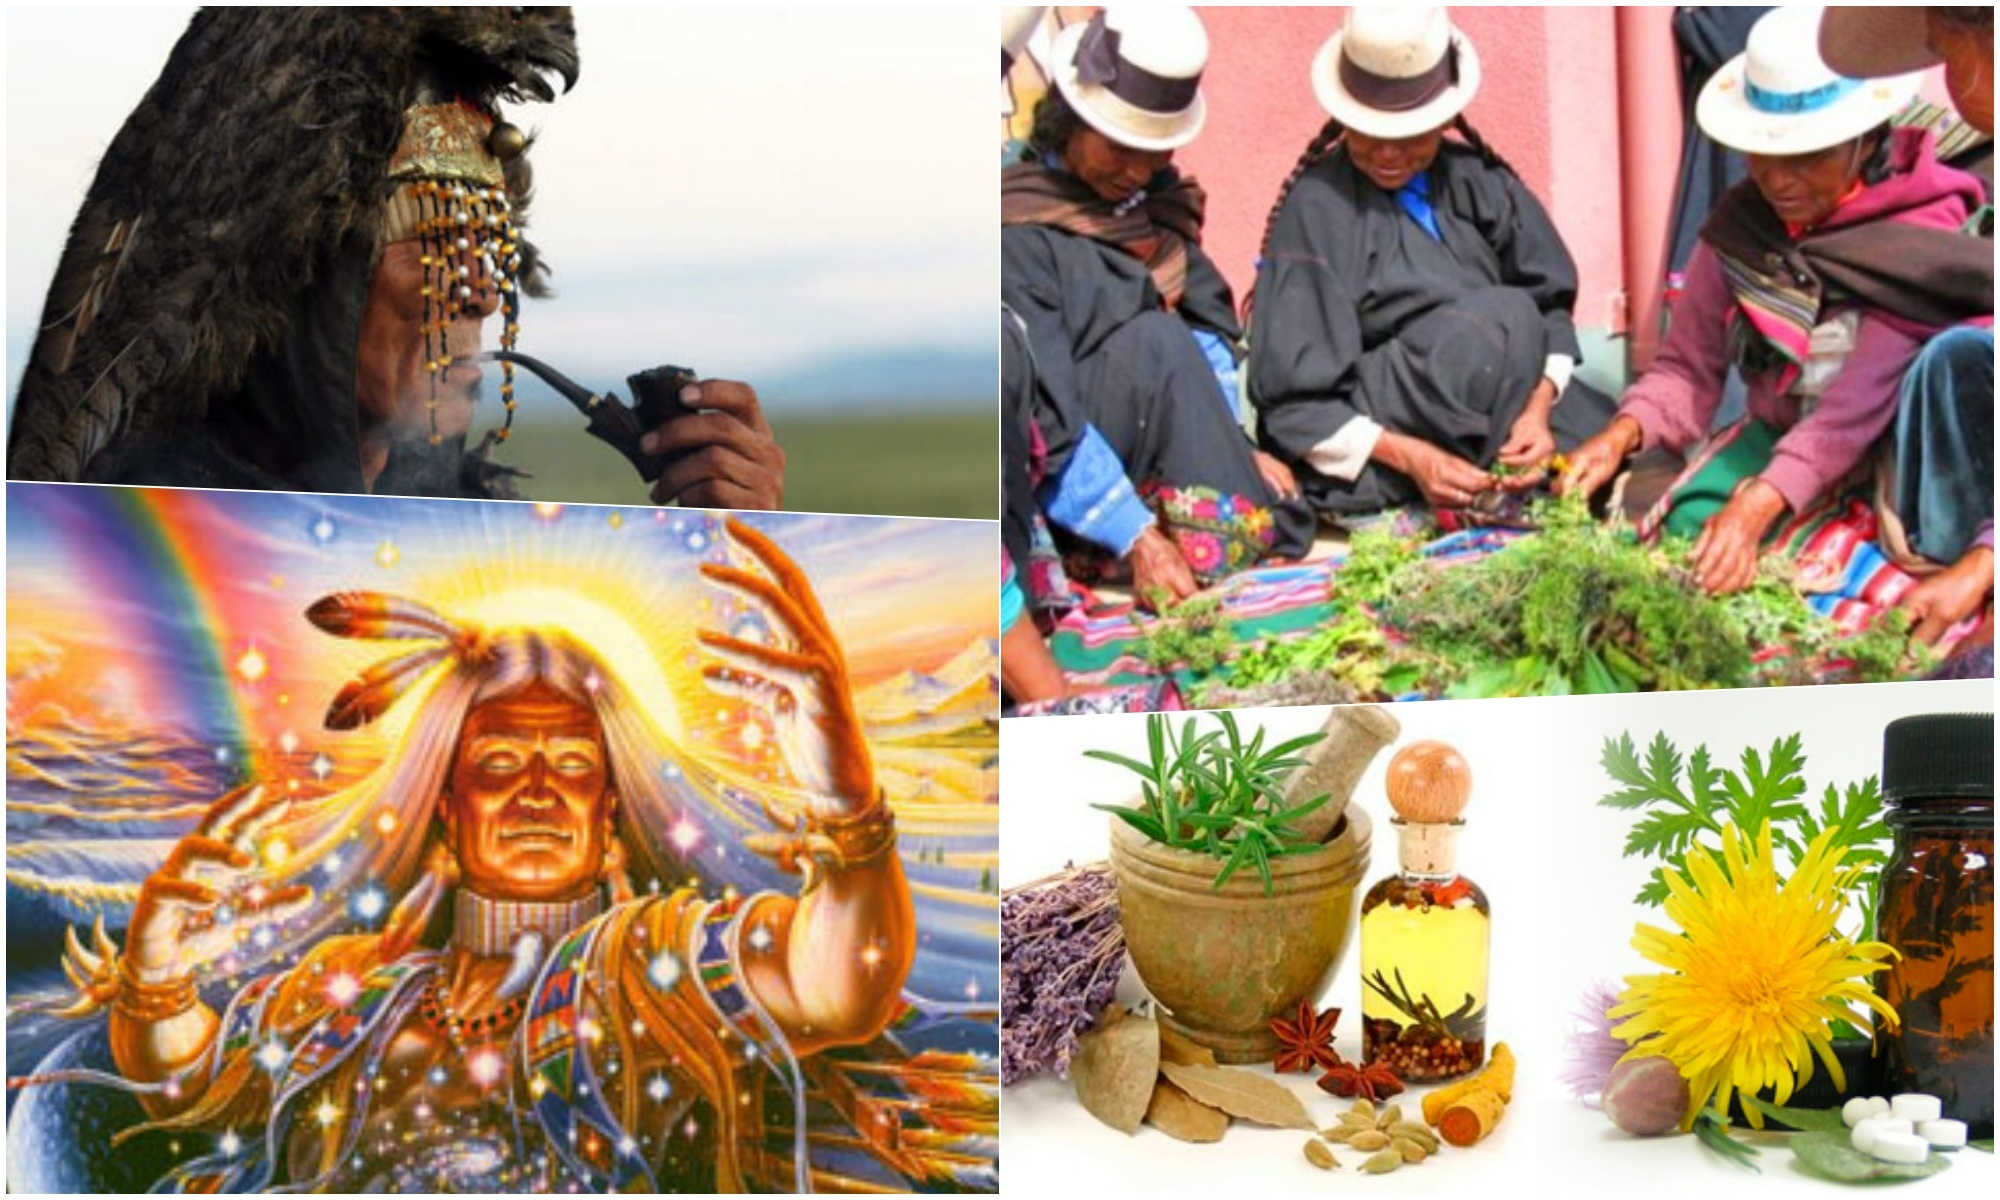 NOTAS SOBRE MEDICINA TRADICIONAL PERUANA